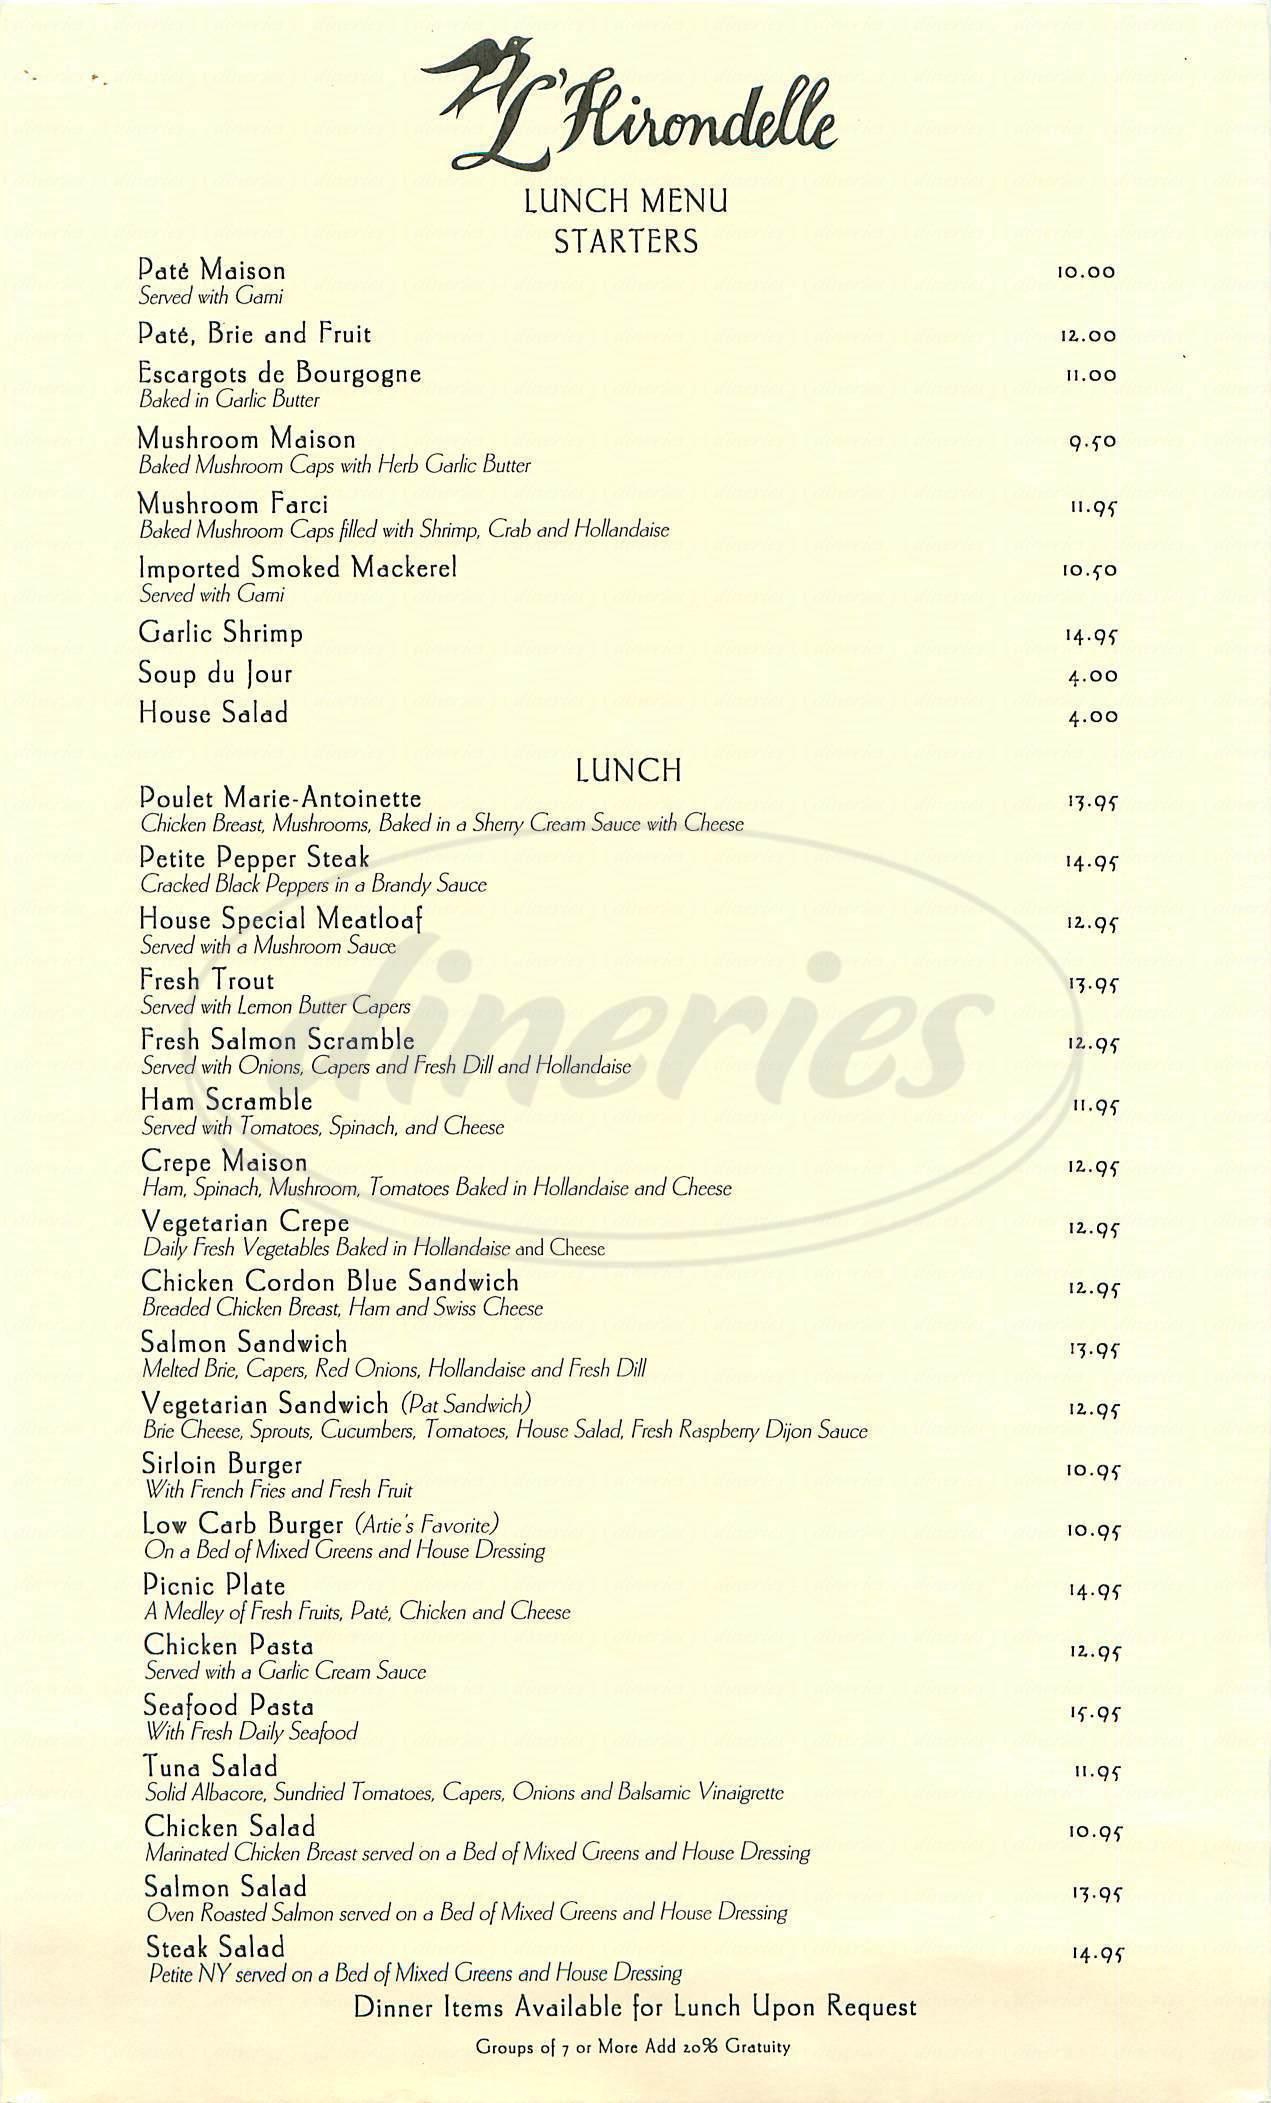 menu for L'Hirondelle